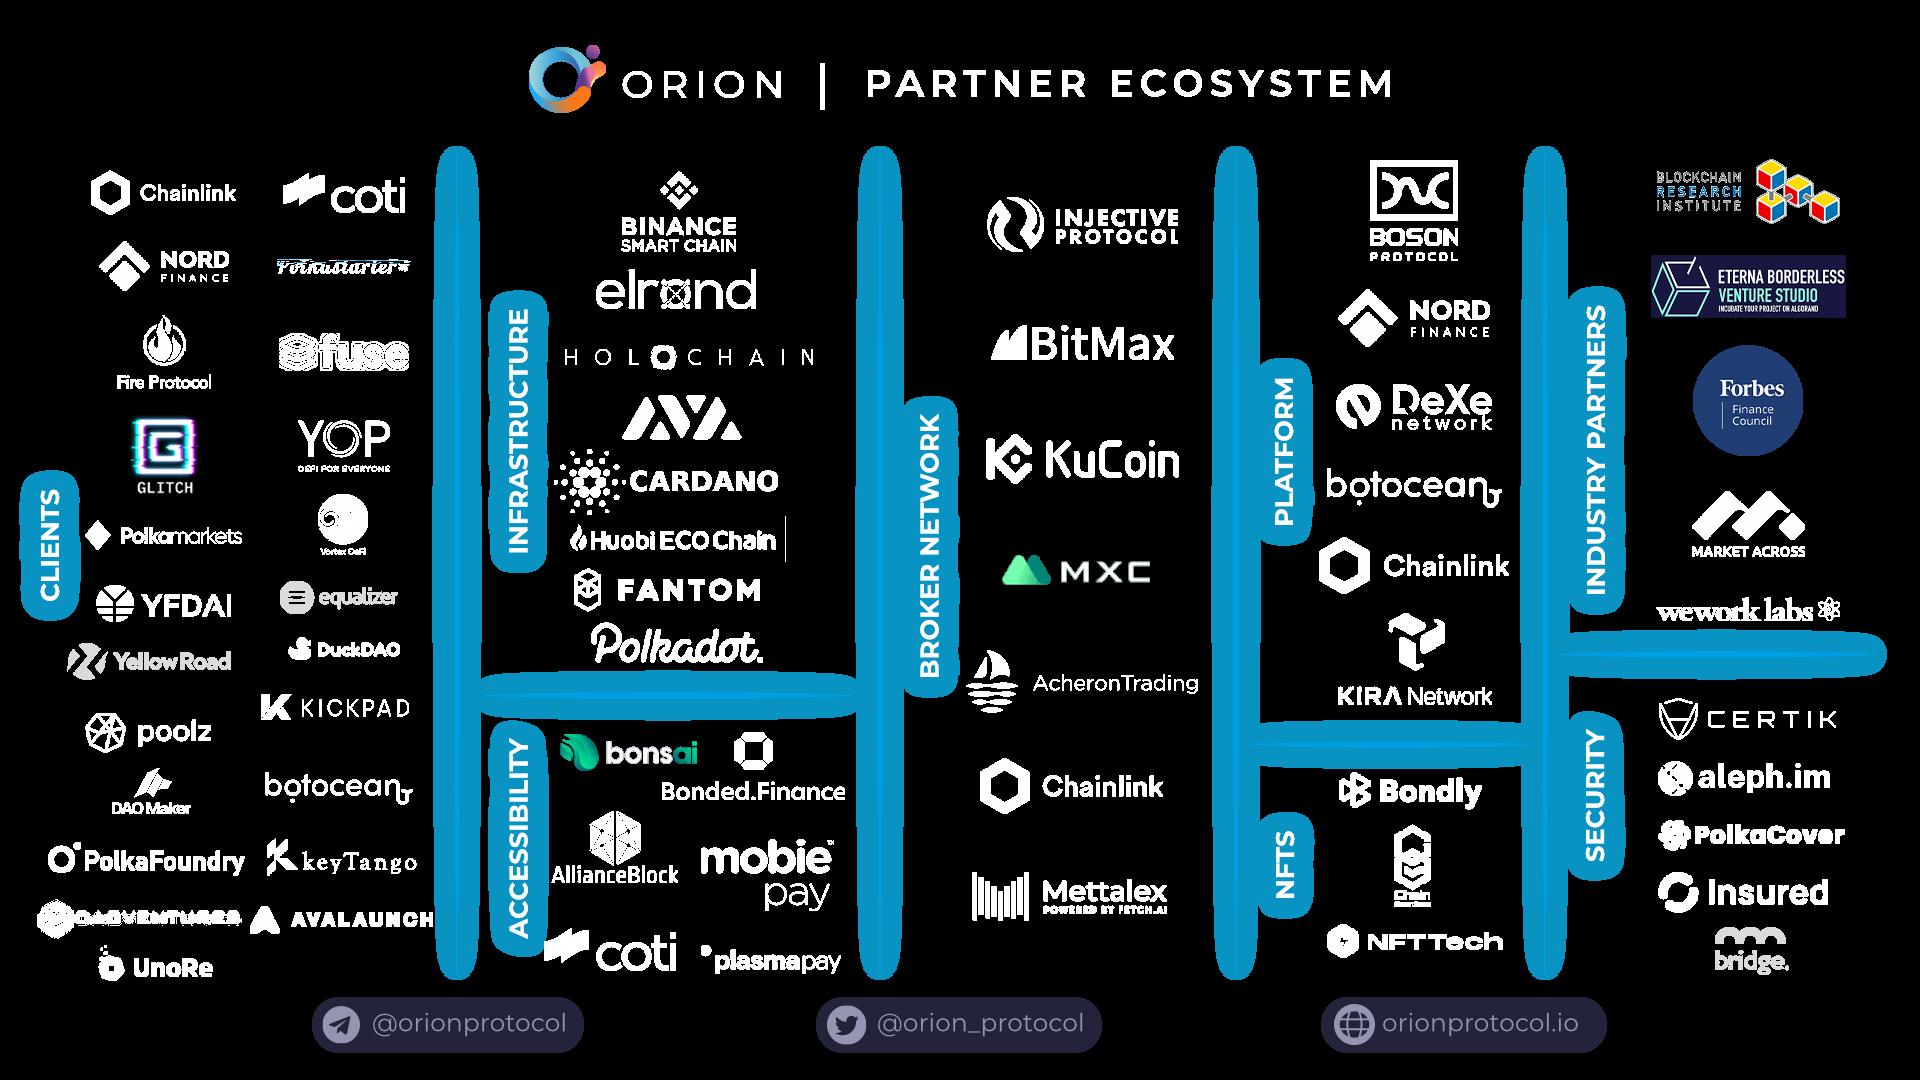 Partnership Ecosystem 27.04.21 clear